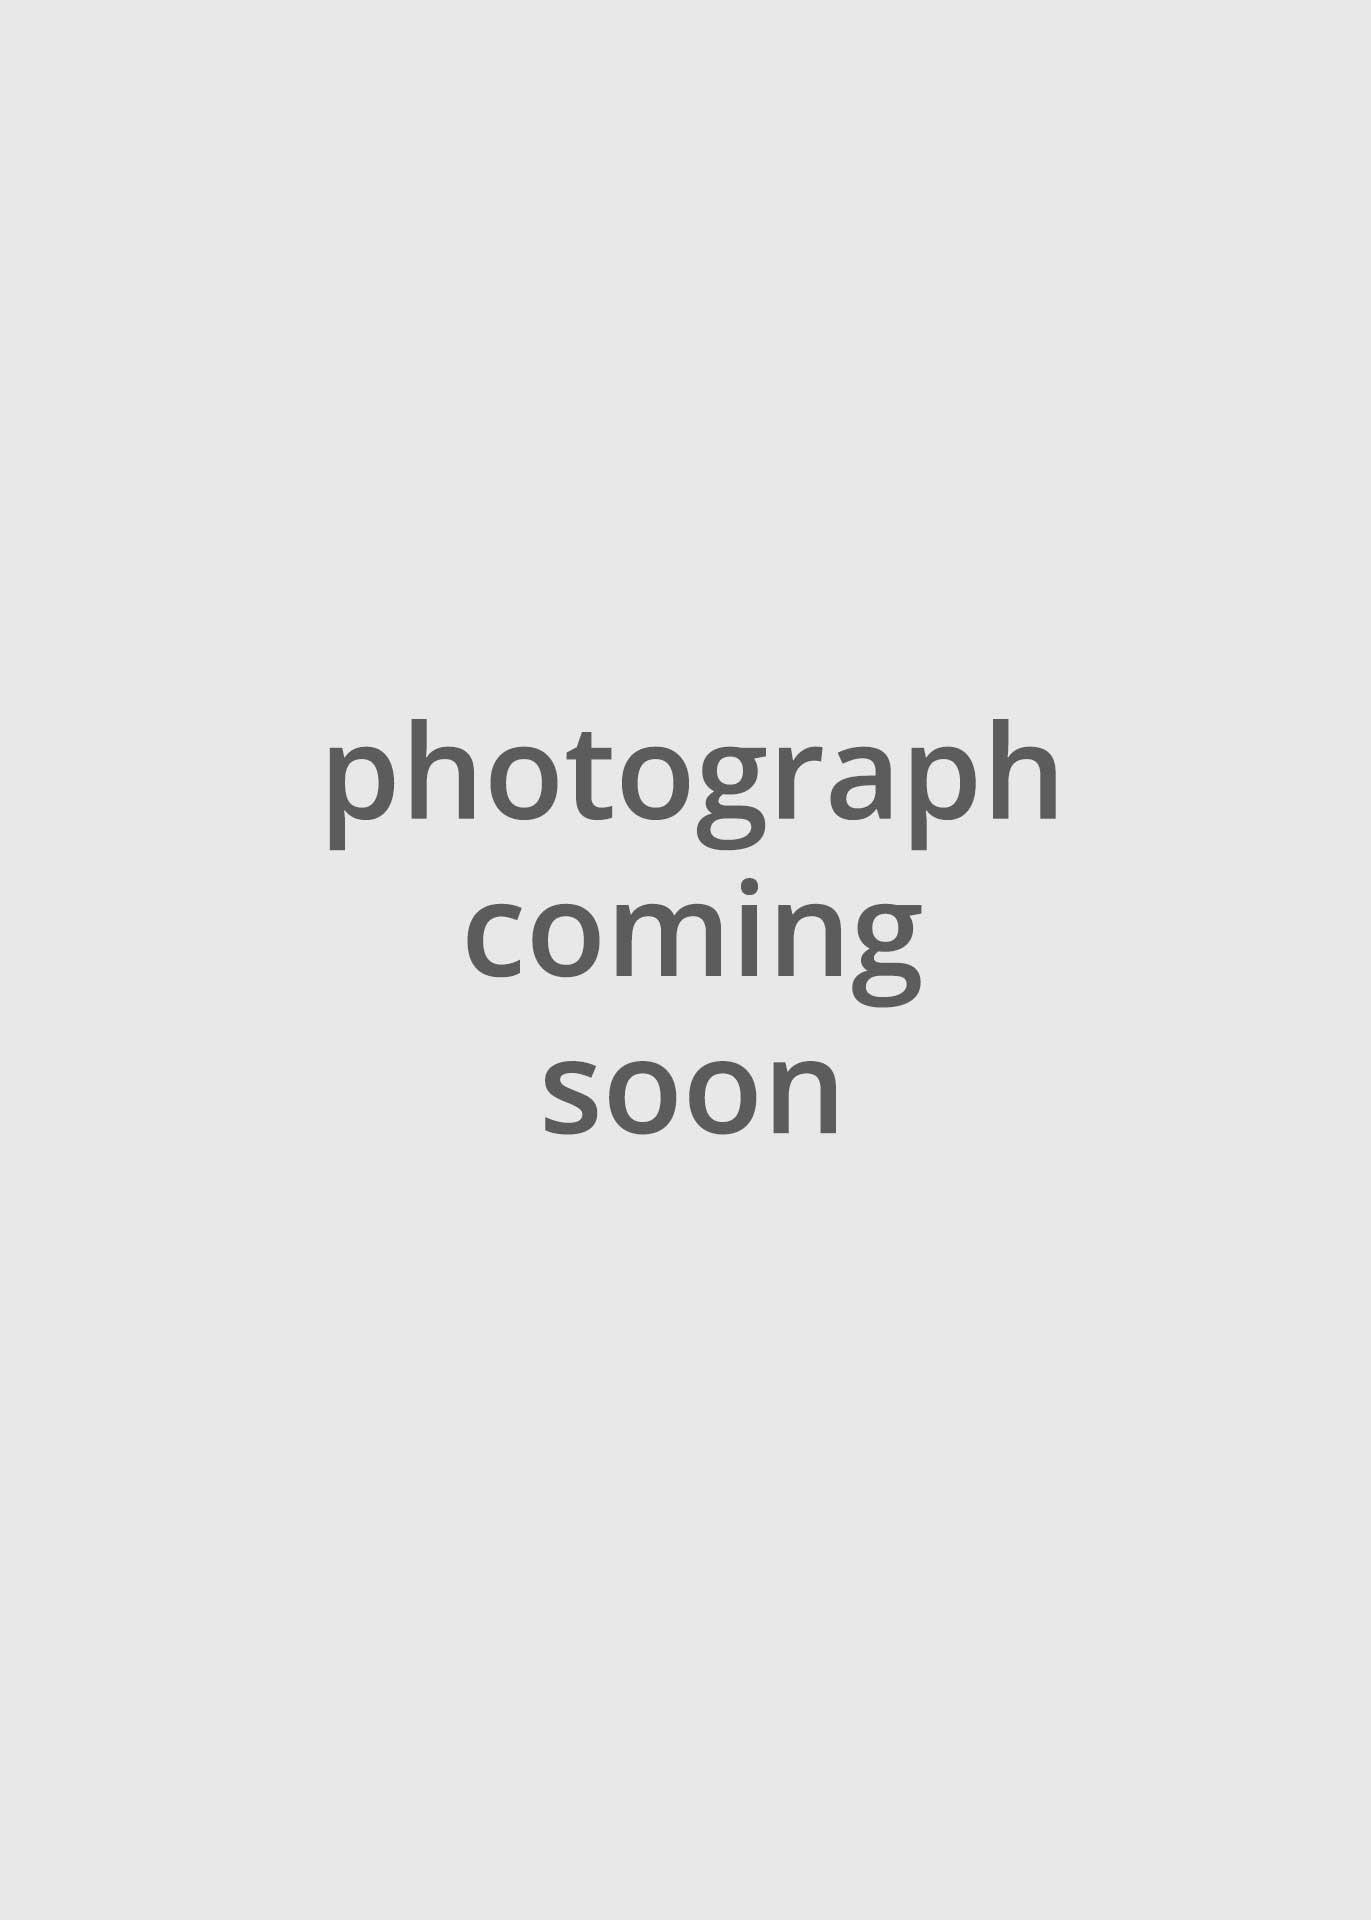 photo-soon